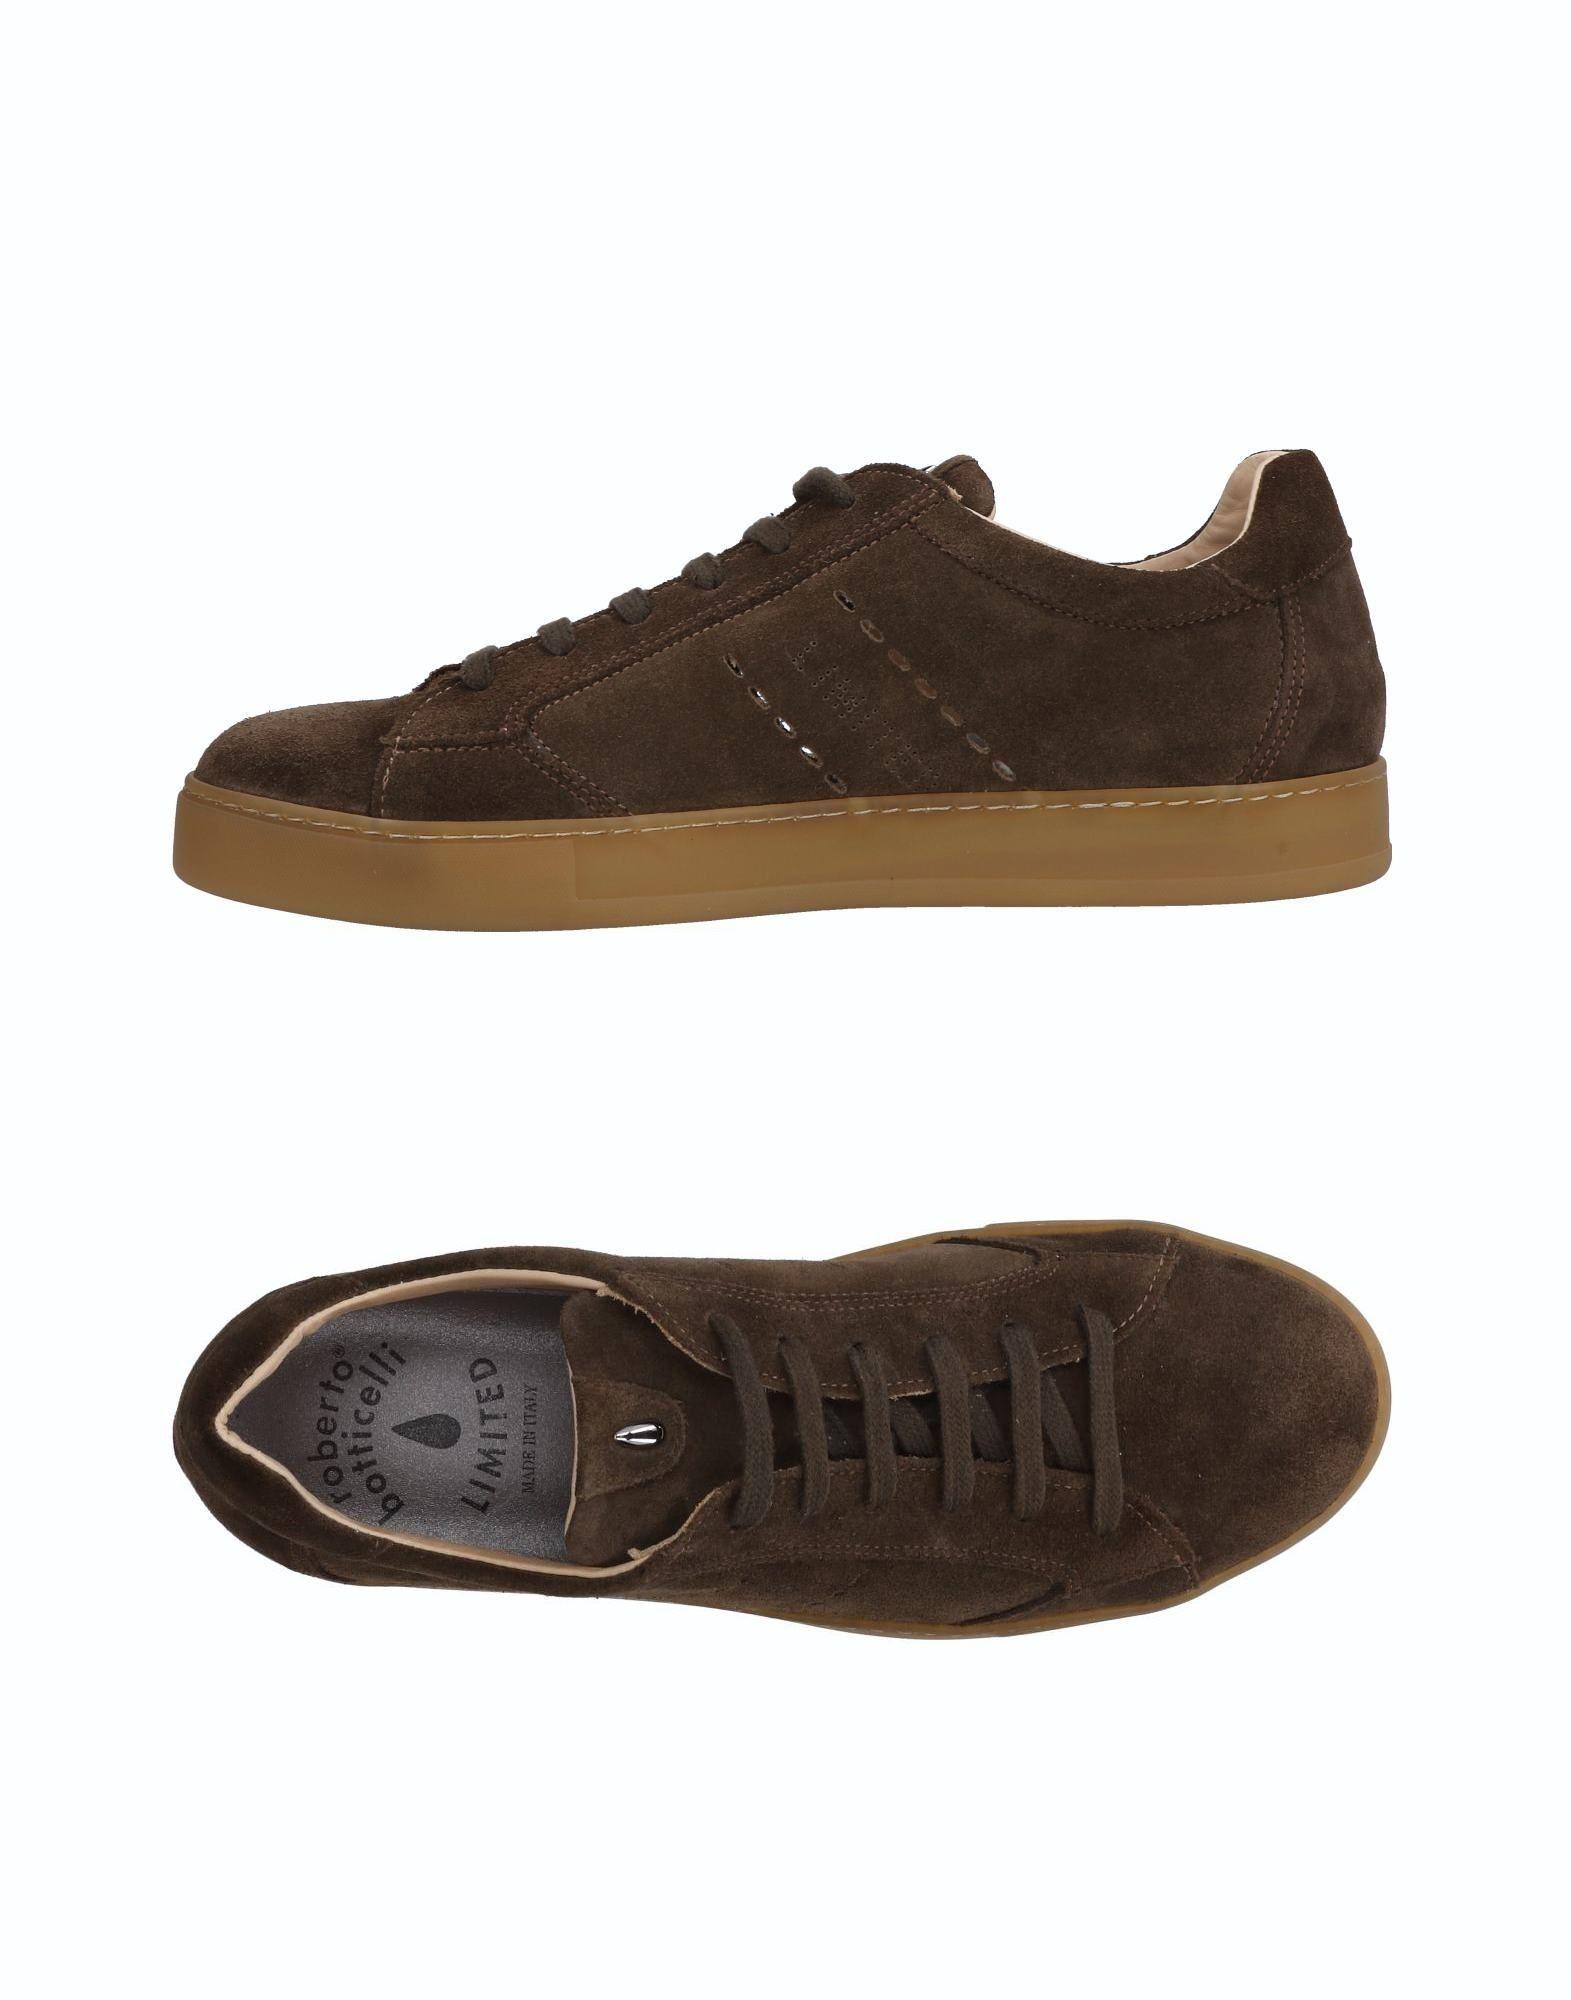 Botticelli Limited Sneakers Herren  11515529HB Gute Qualität beliebte Schuhe